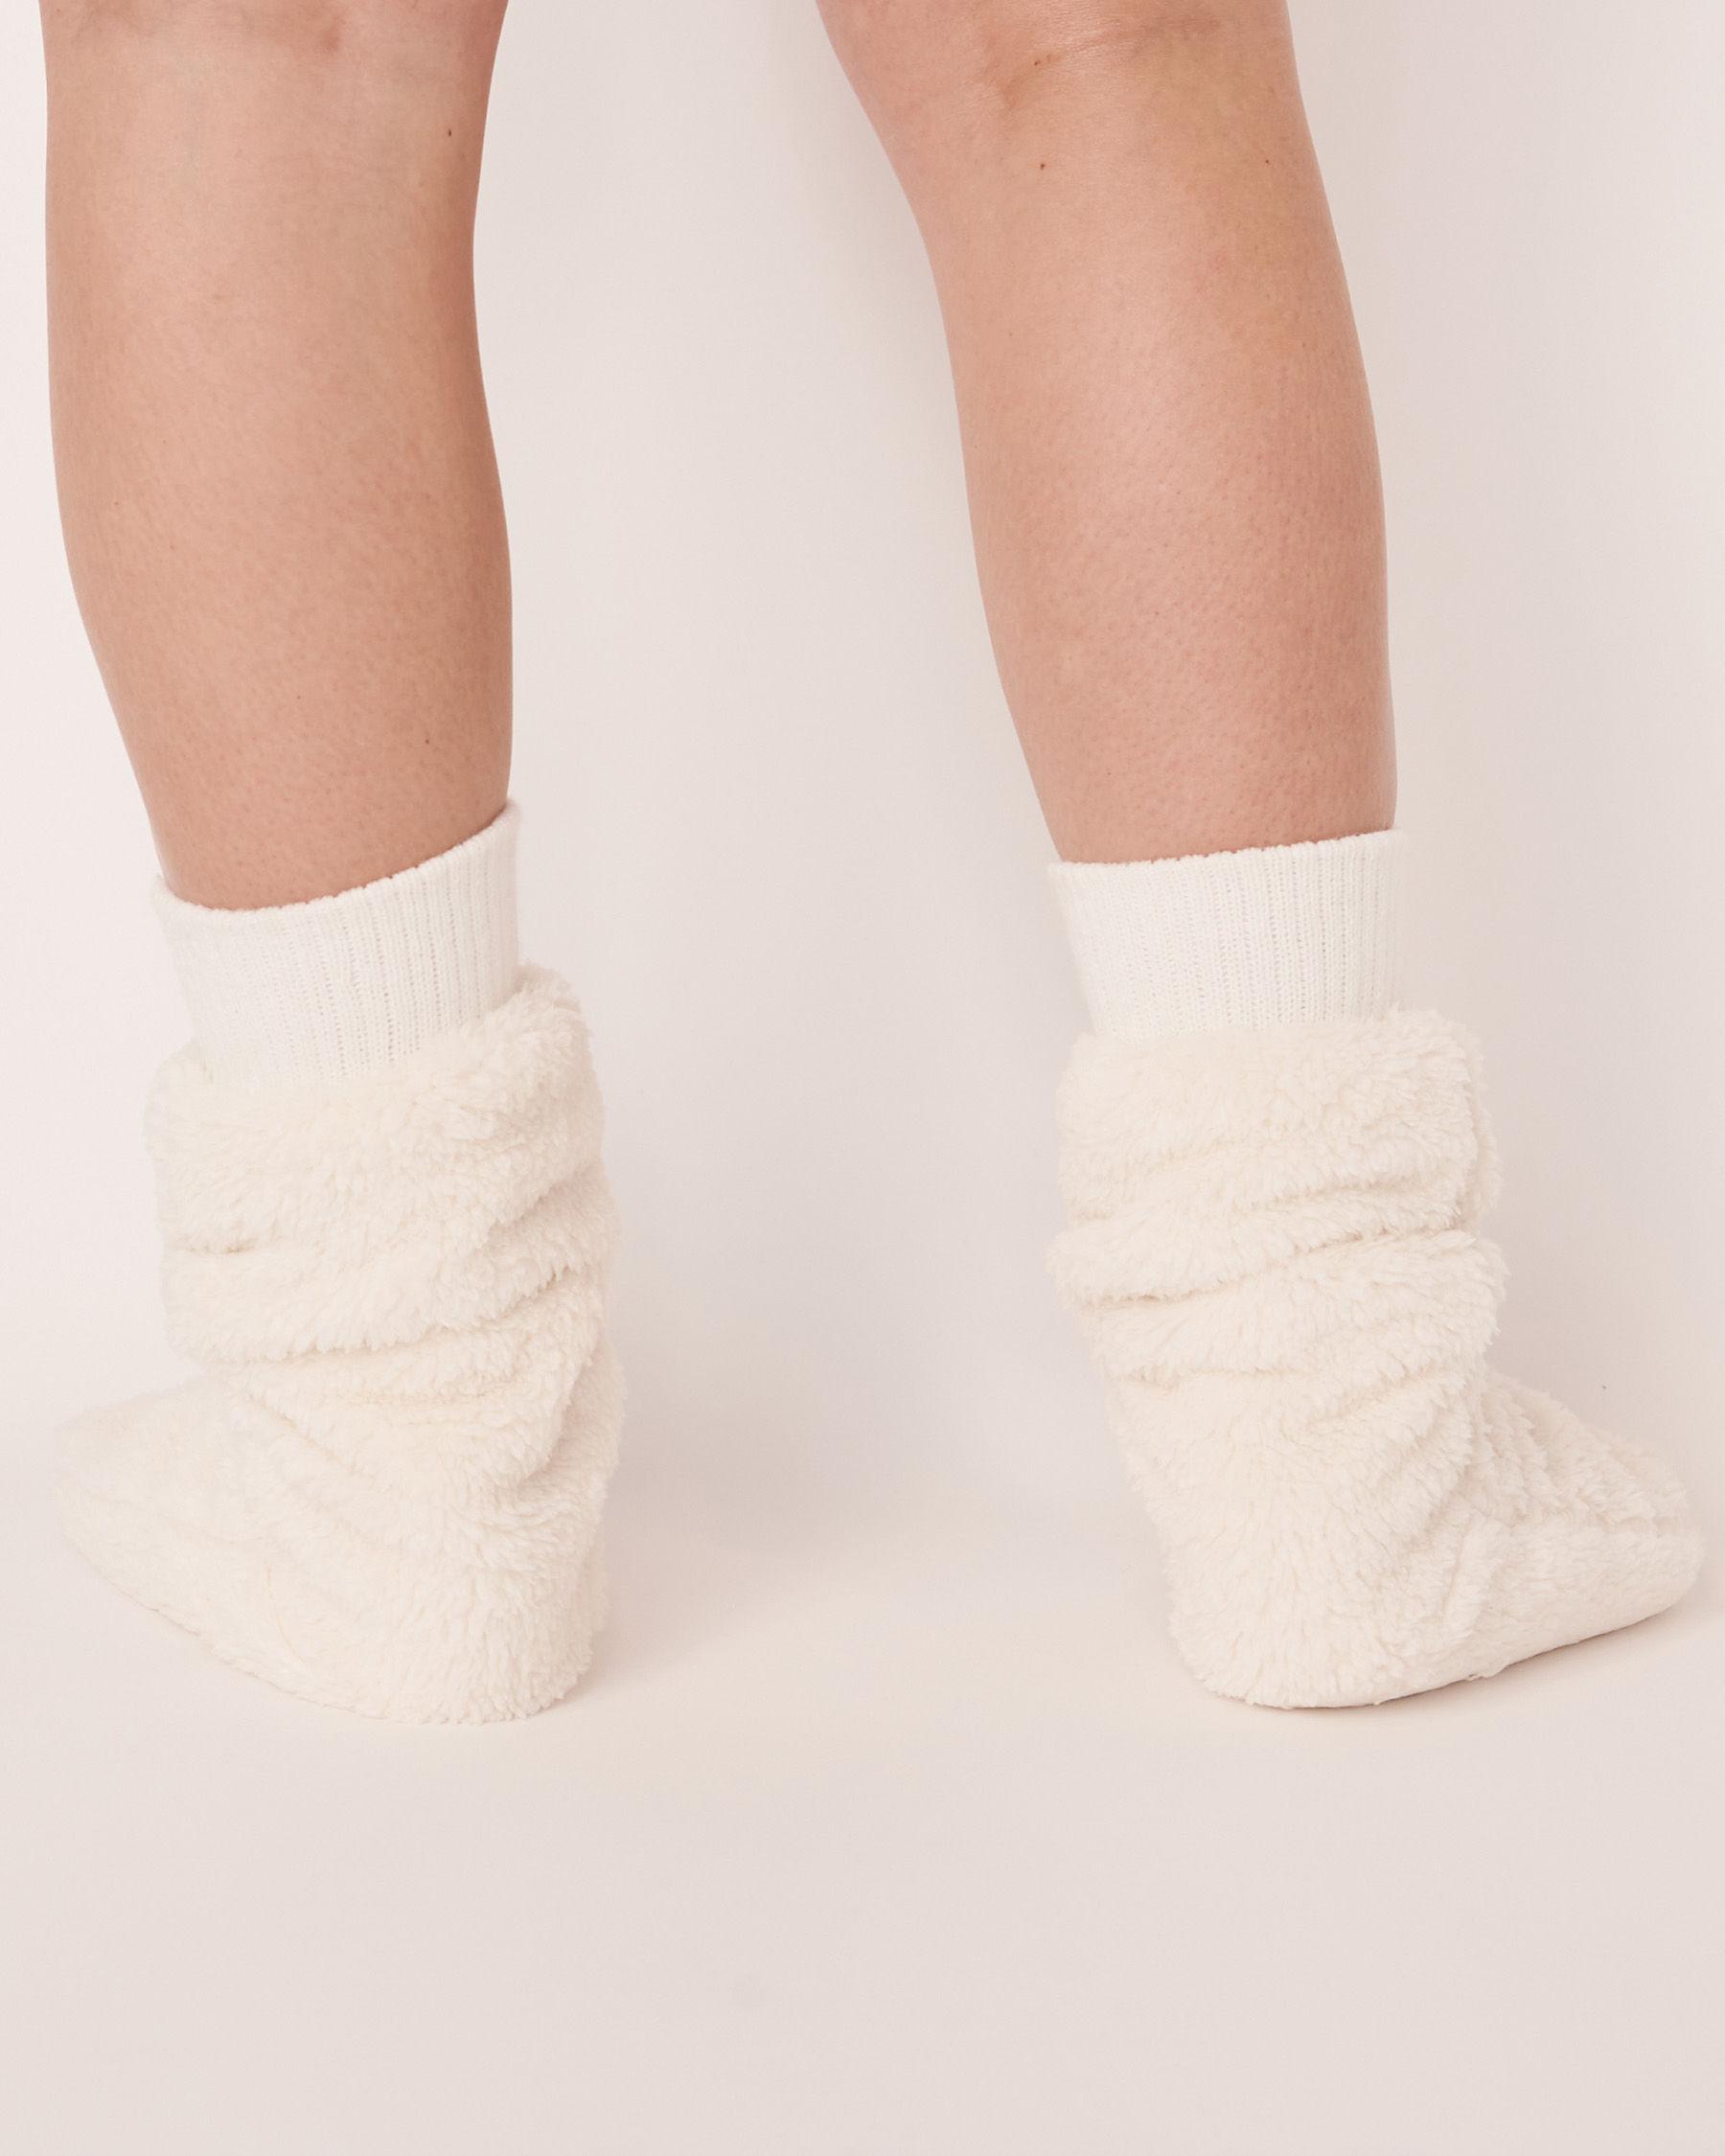 LA VIE EN ROSE Plush Mid Length Socks White 40700050 - View4